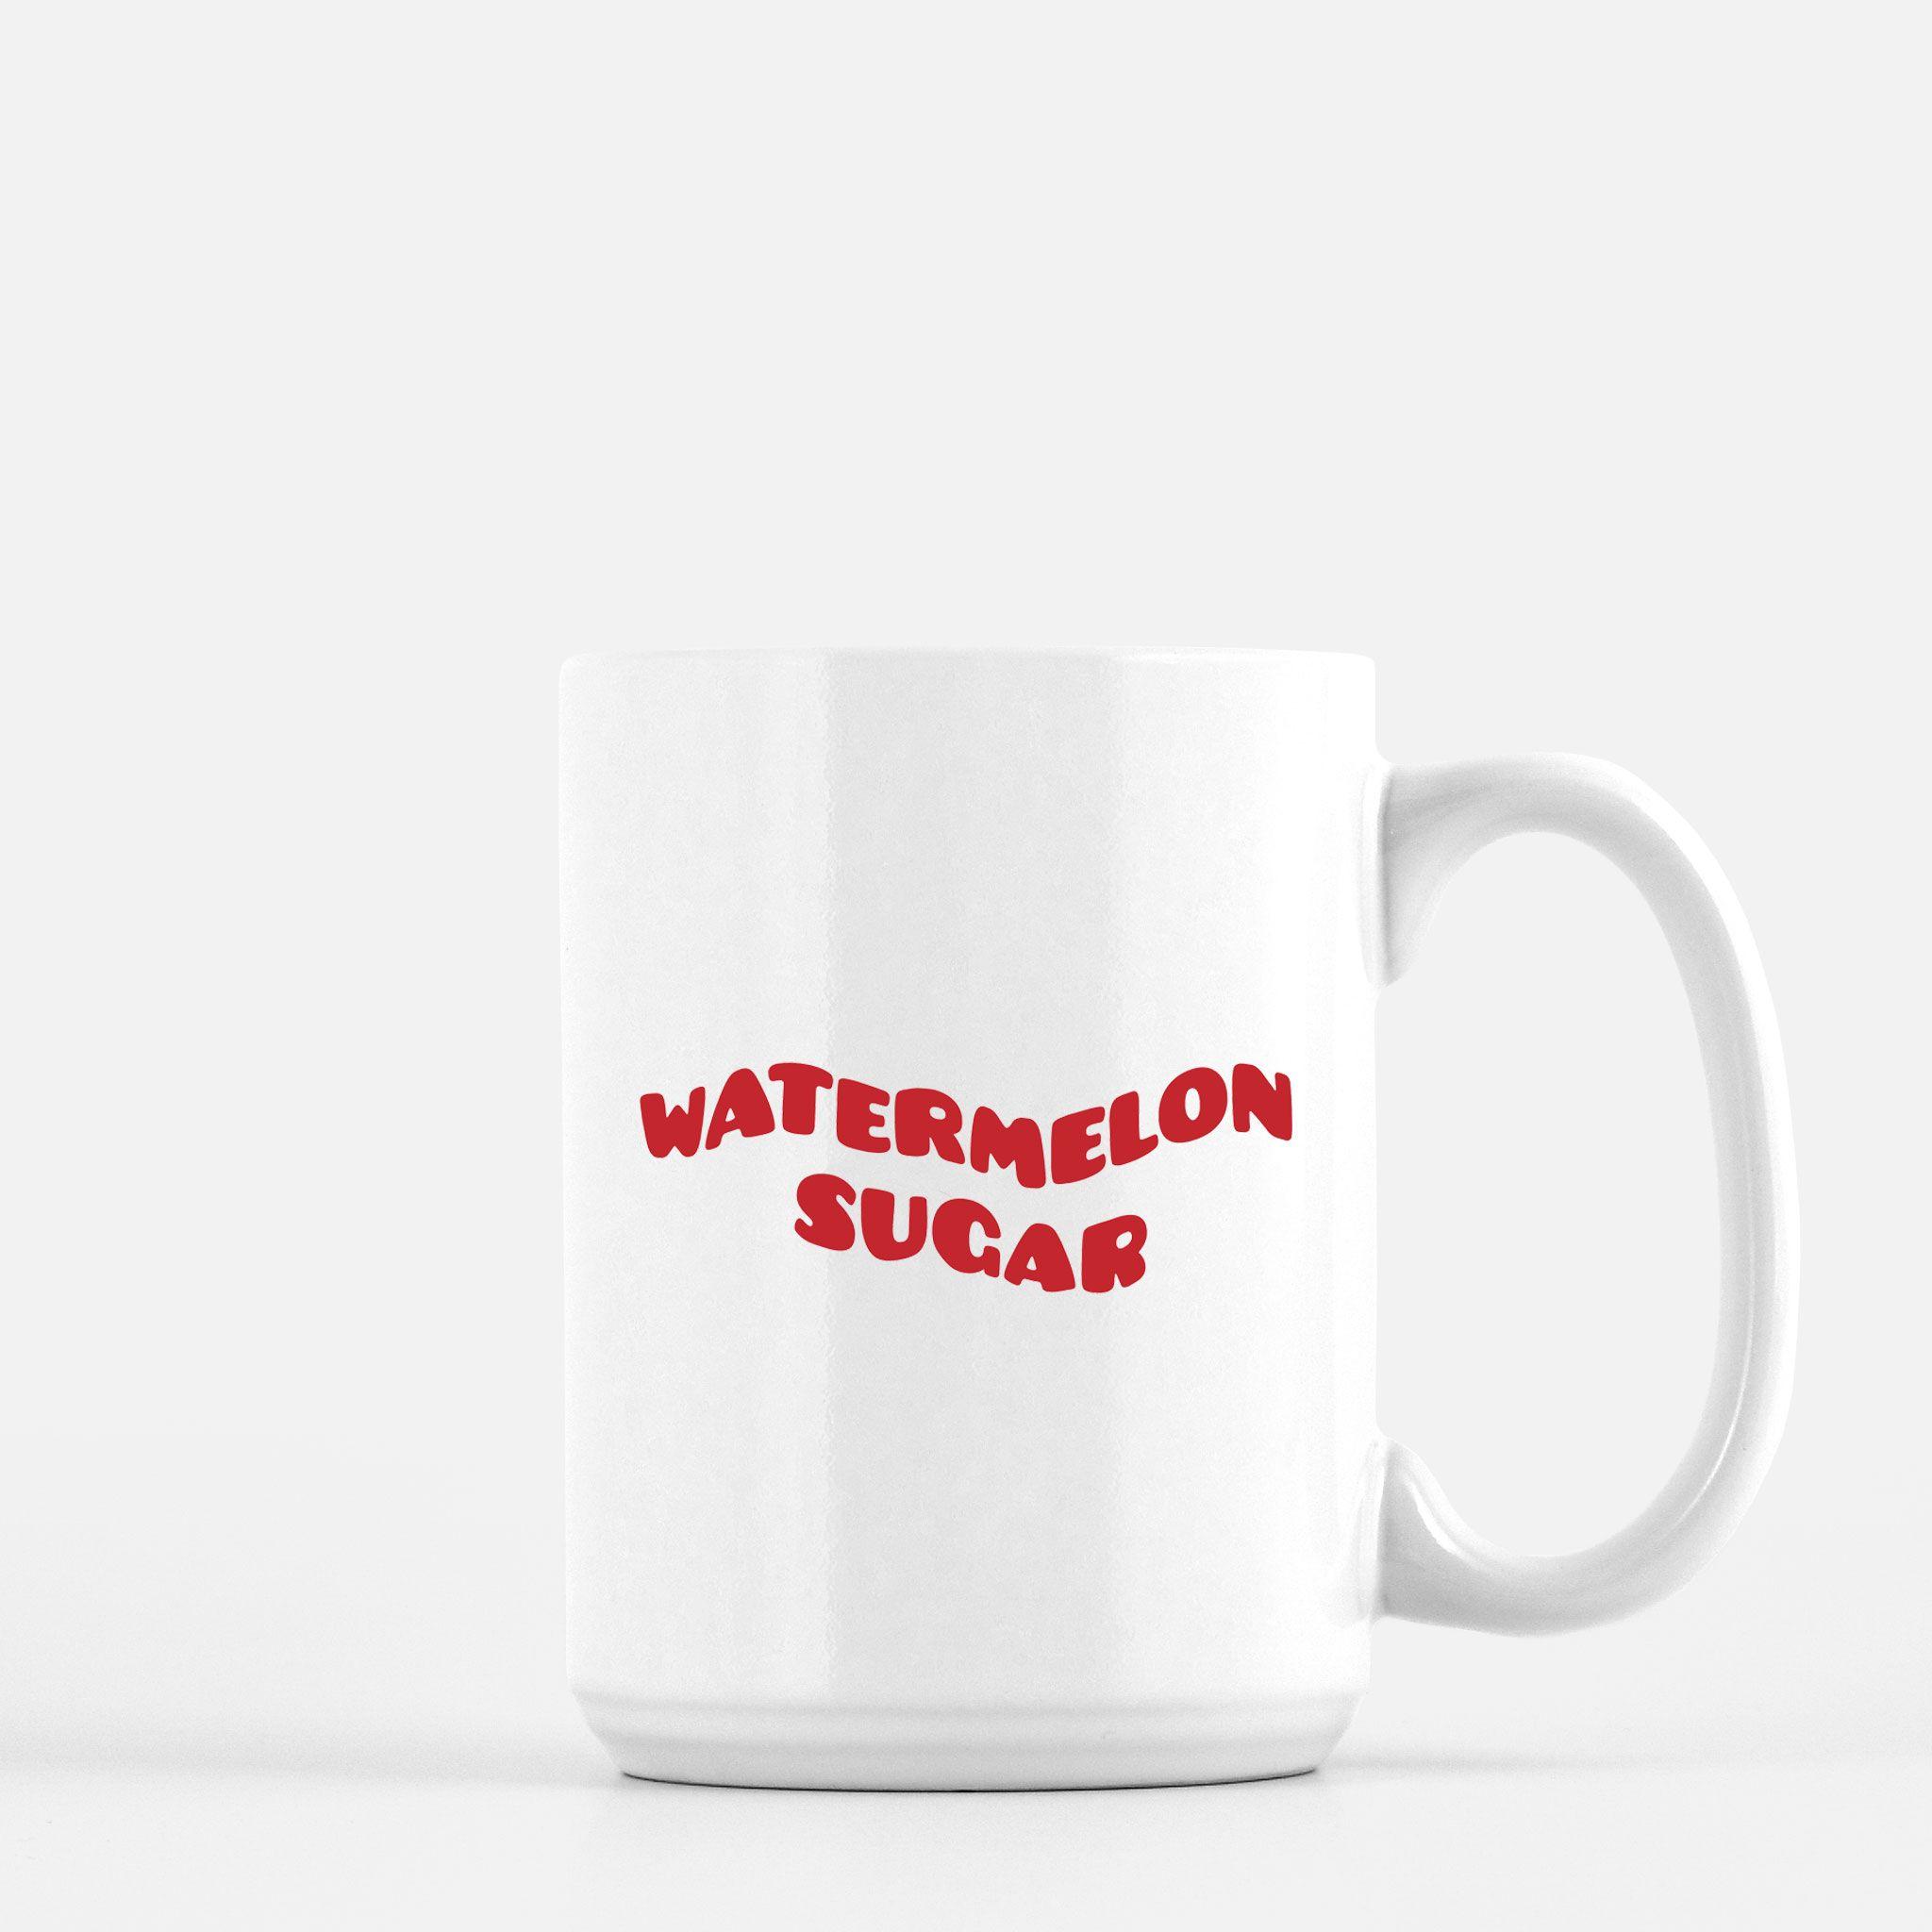 Watermelon Sugar Mug | Fine Line Harry Styles | Tik Tok ...